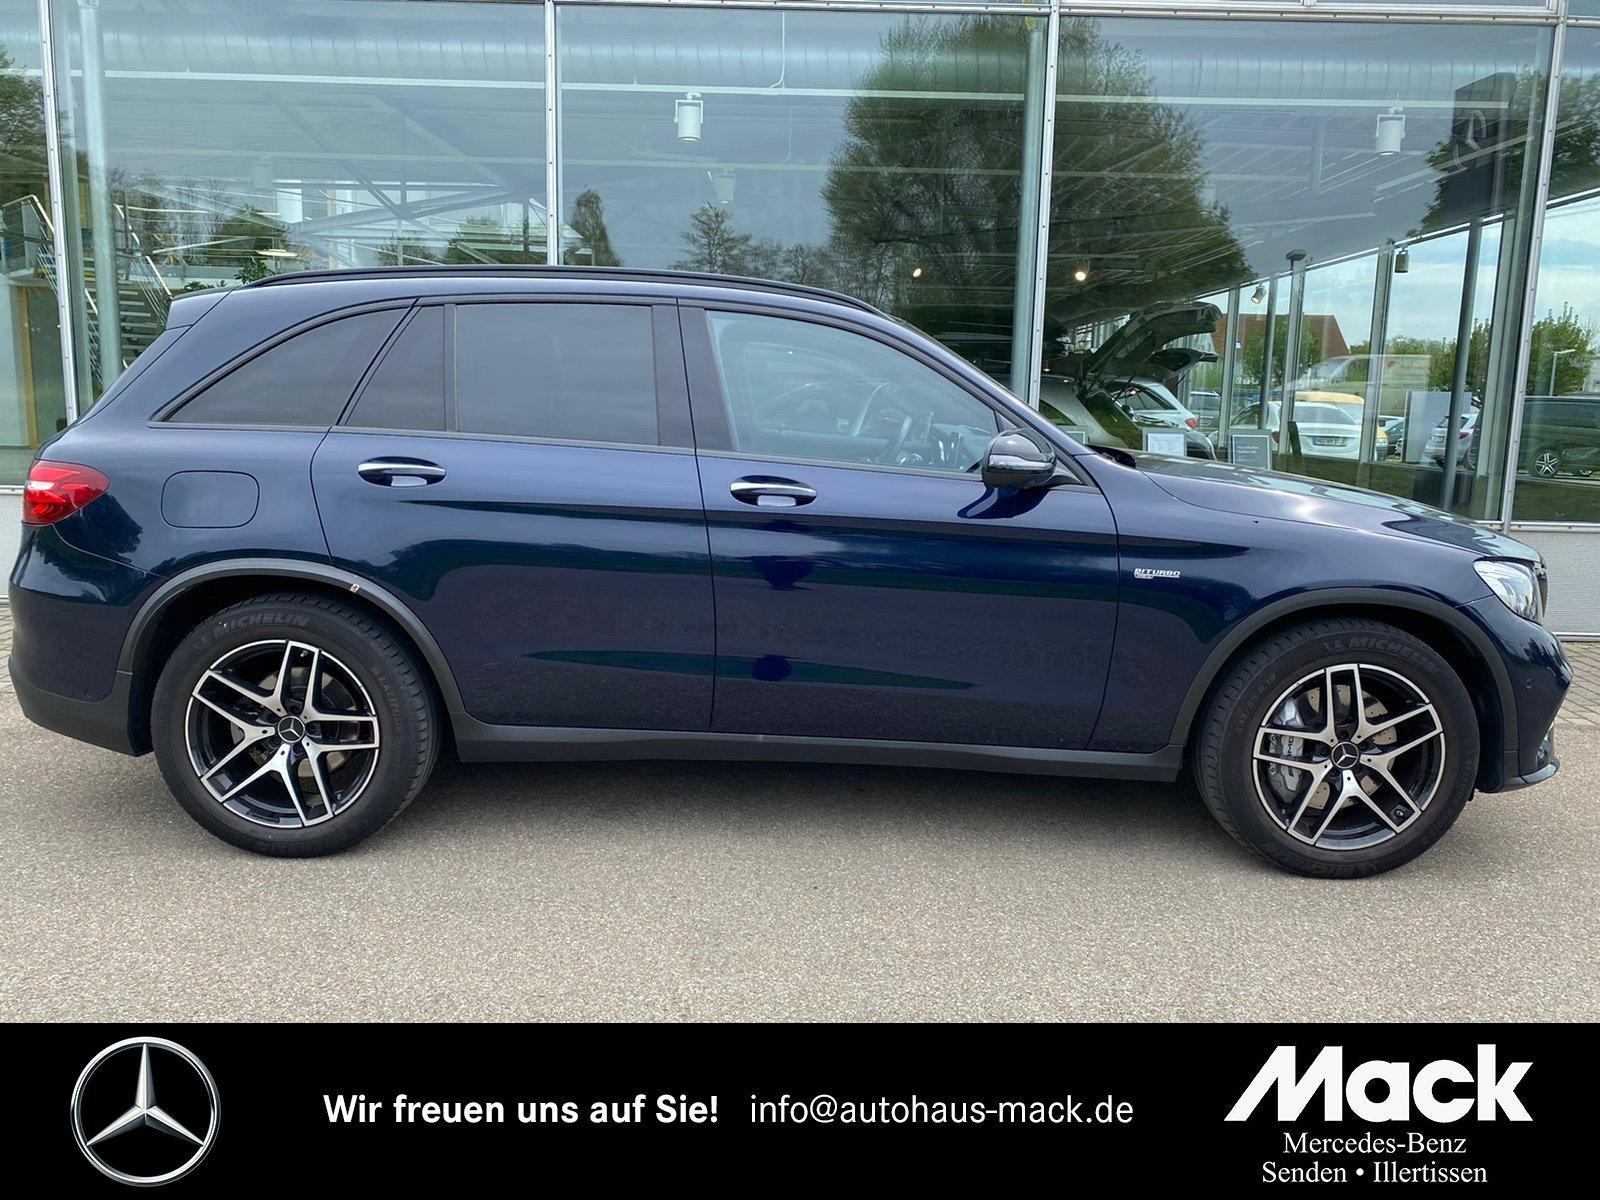 Mercedes-Benz GLC 43 AMG 4MATIC Leder+LED-ILS+Pano.+DISTRONIC, Jahr 2017, Benzin